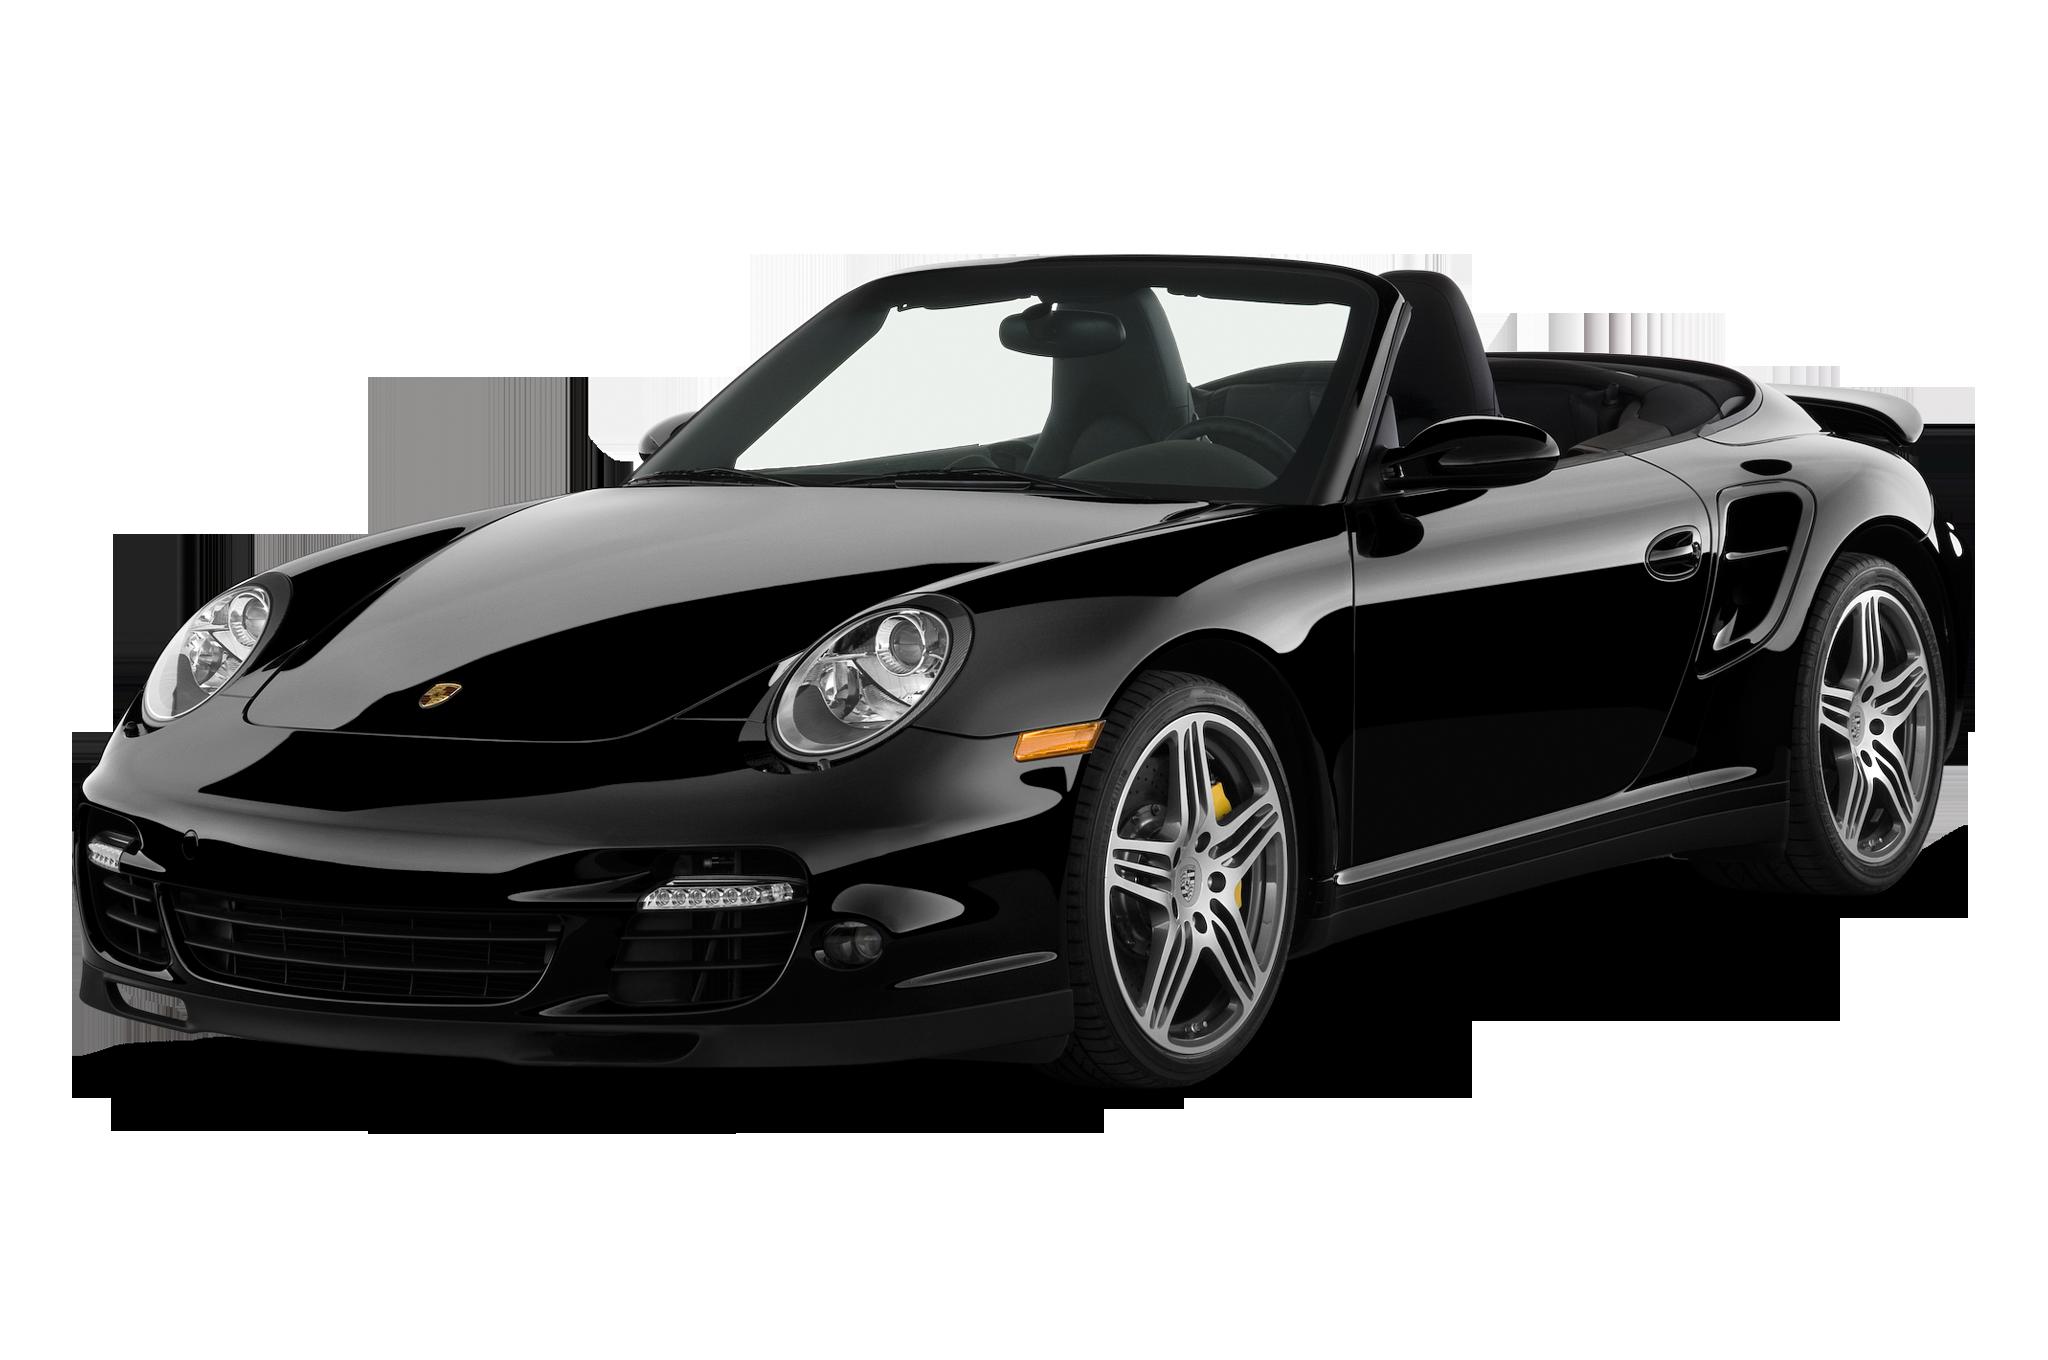 2012 porsche 911 turbo s cabriolet editors 39 notebook. Black Bedroom Furniture Sets. Home Design Ideas